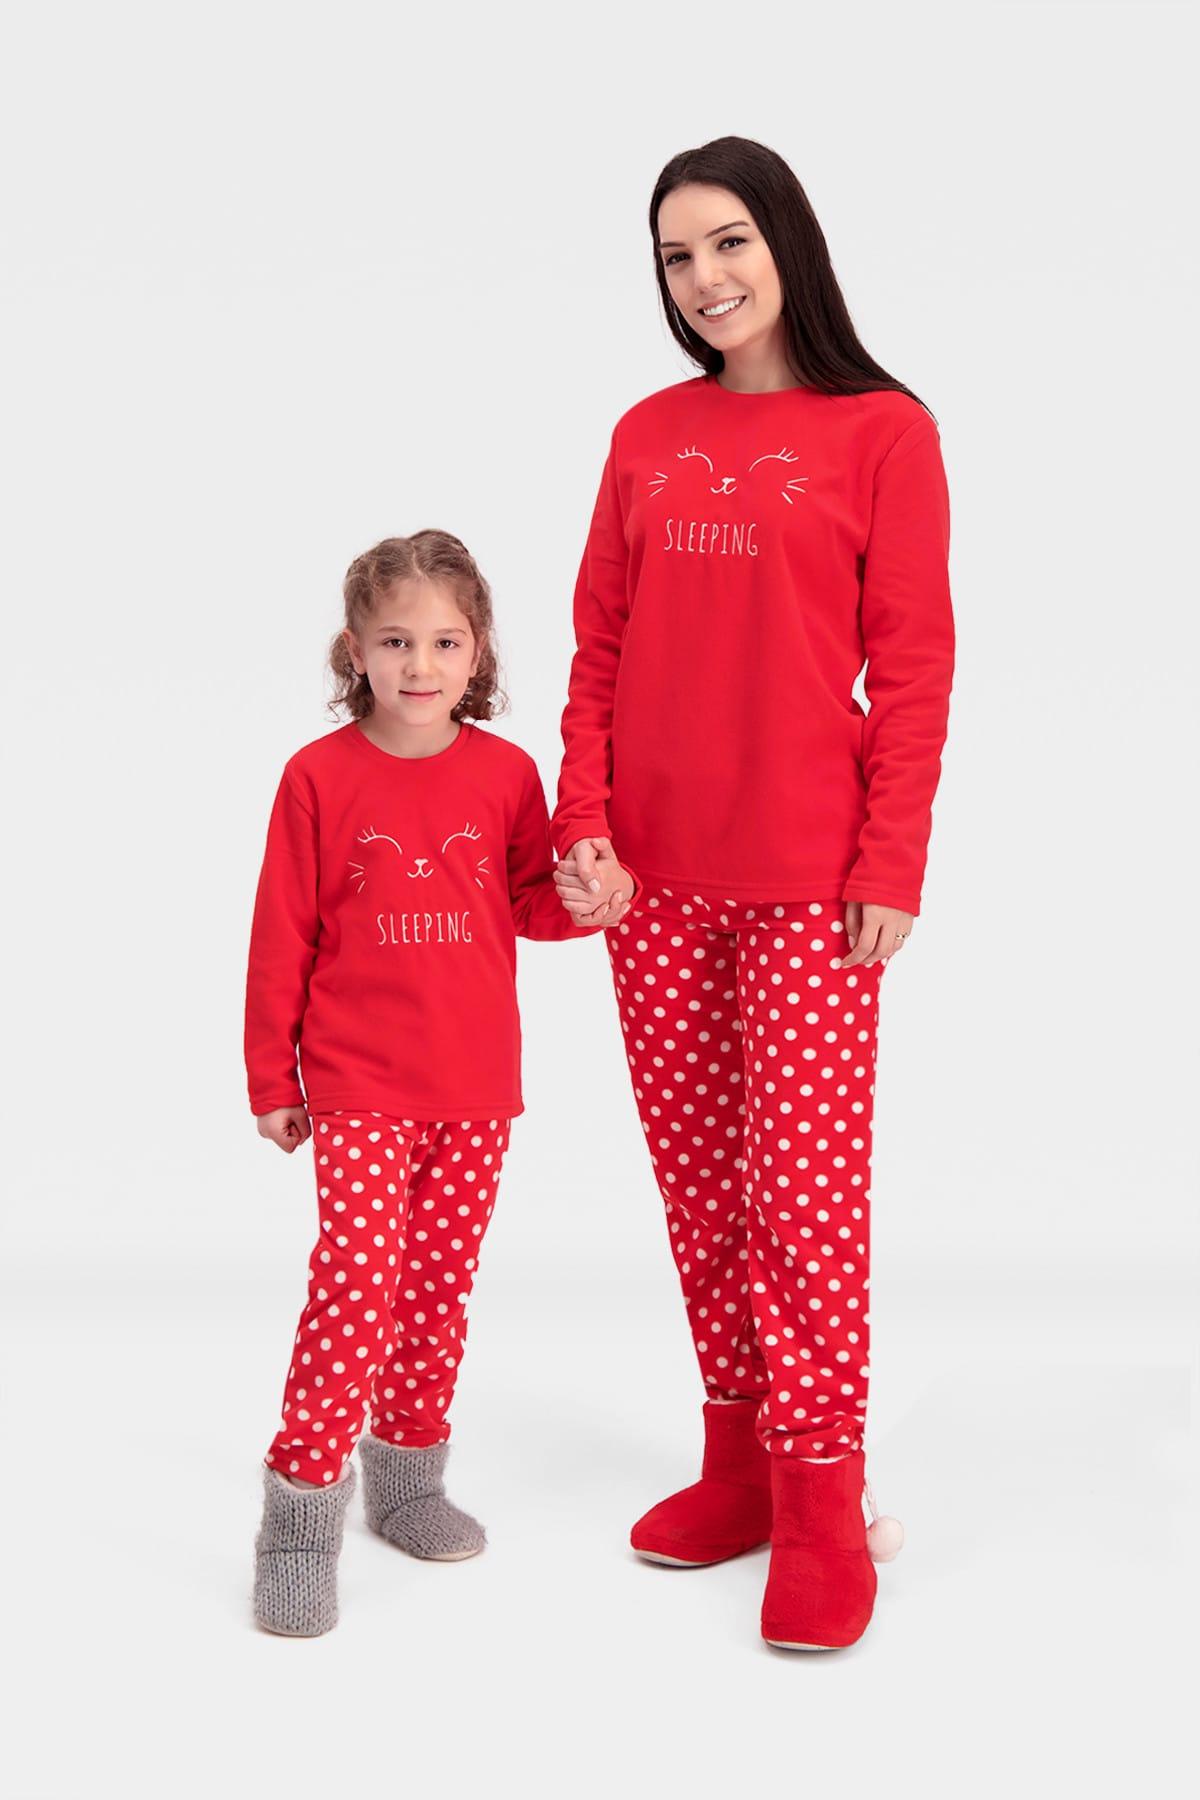 ROLY POLY Sleeping Bunny Polar Kadın Pijama Takımı Kırmızı 2